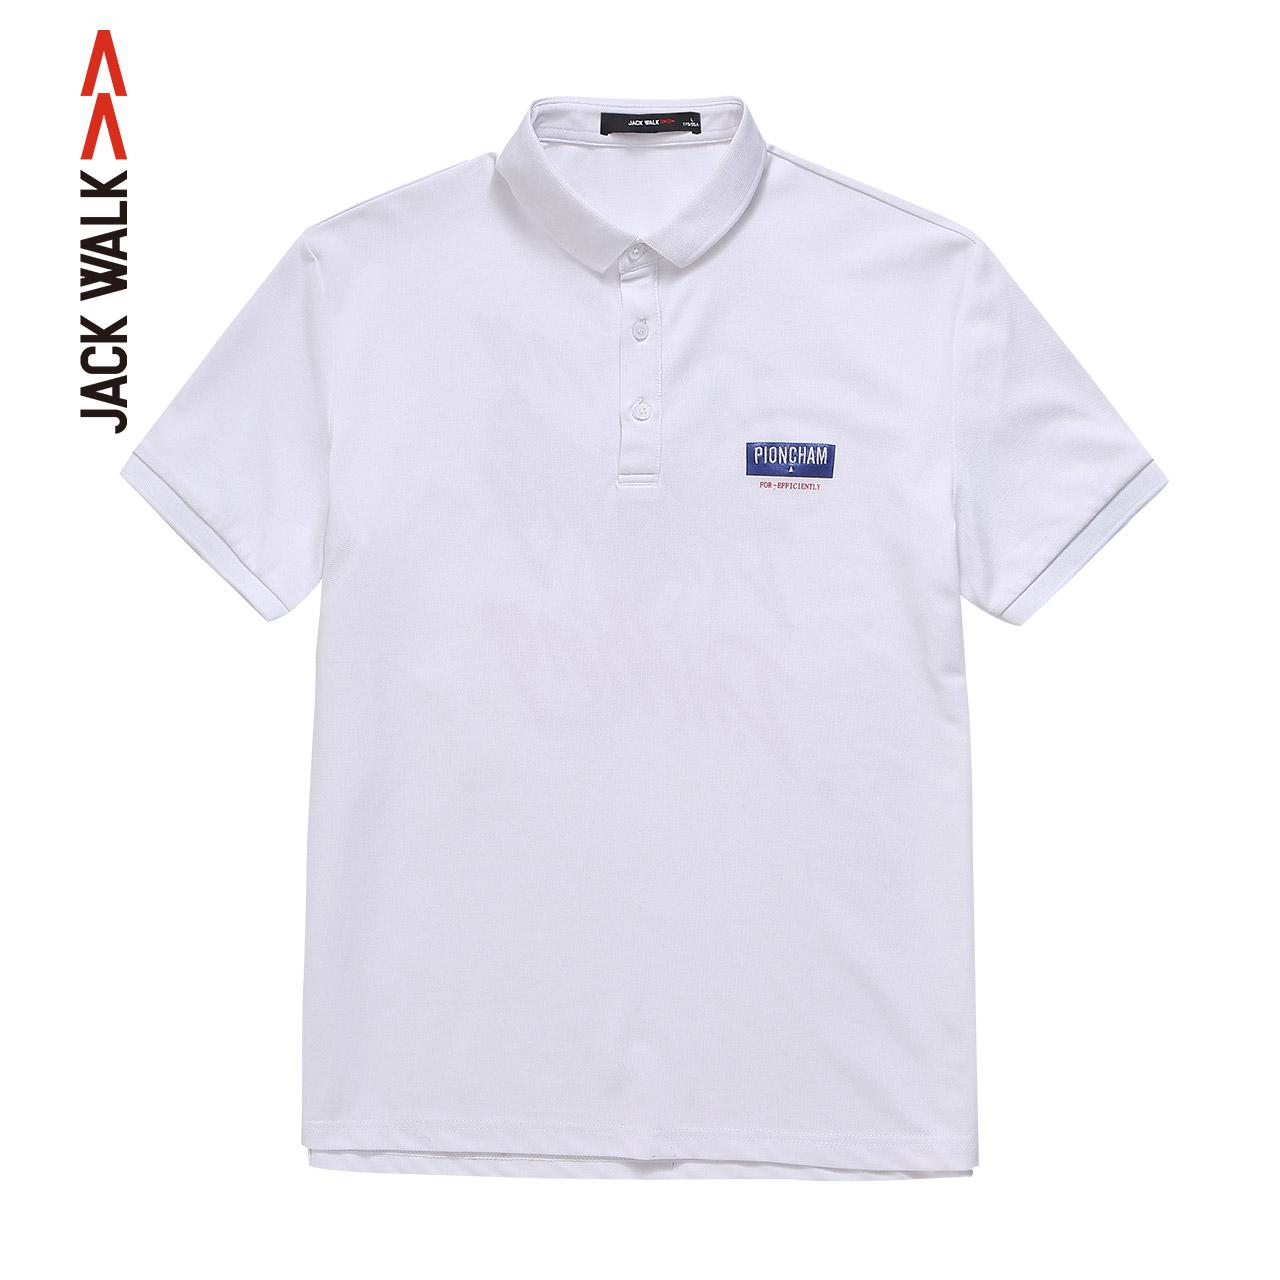 La chapel mens jackwalk casual Polo Shirt New Summer 2019 printed collar short sleeve T-shirt for men